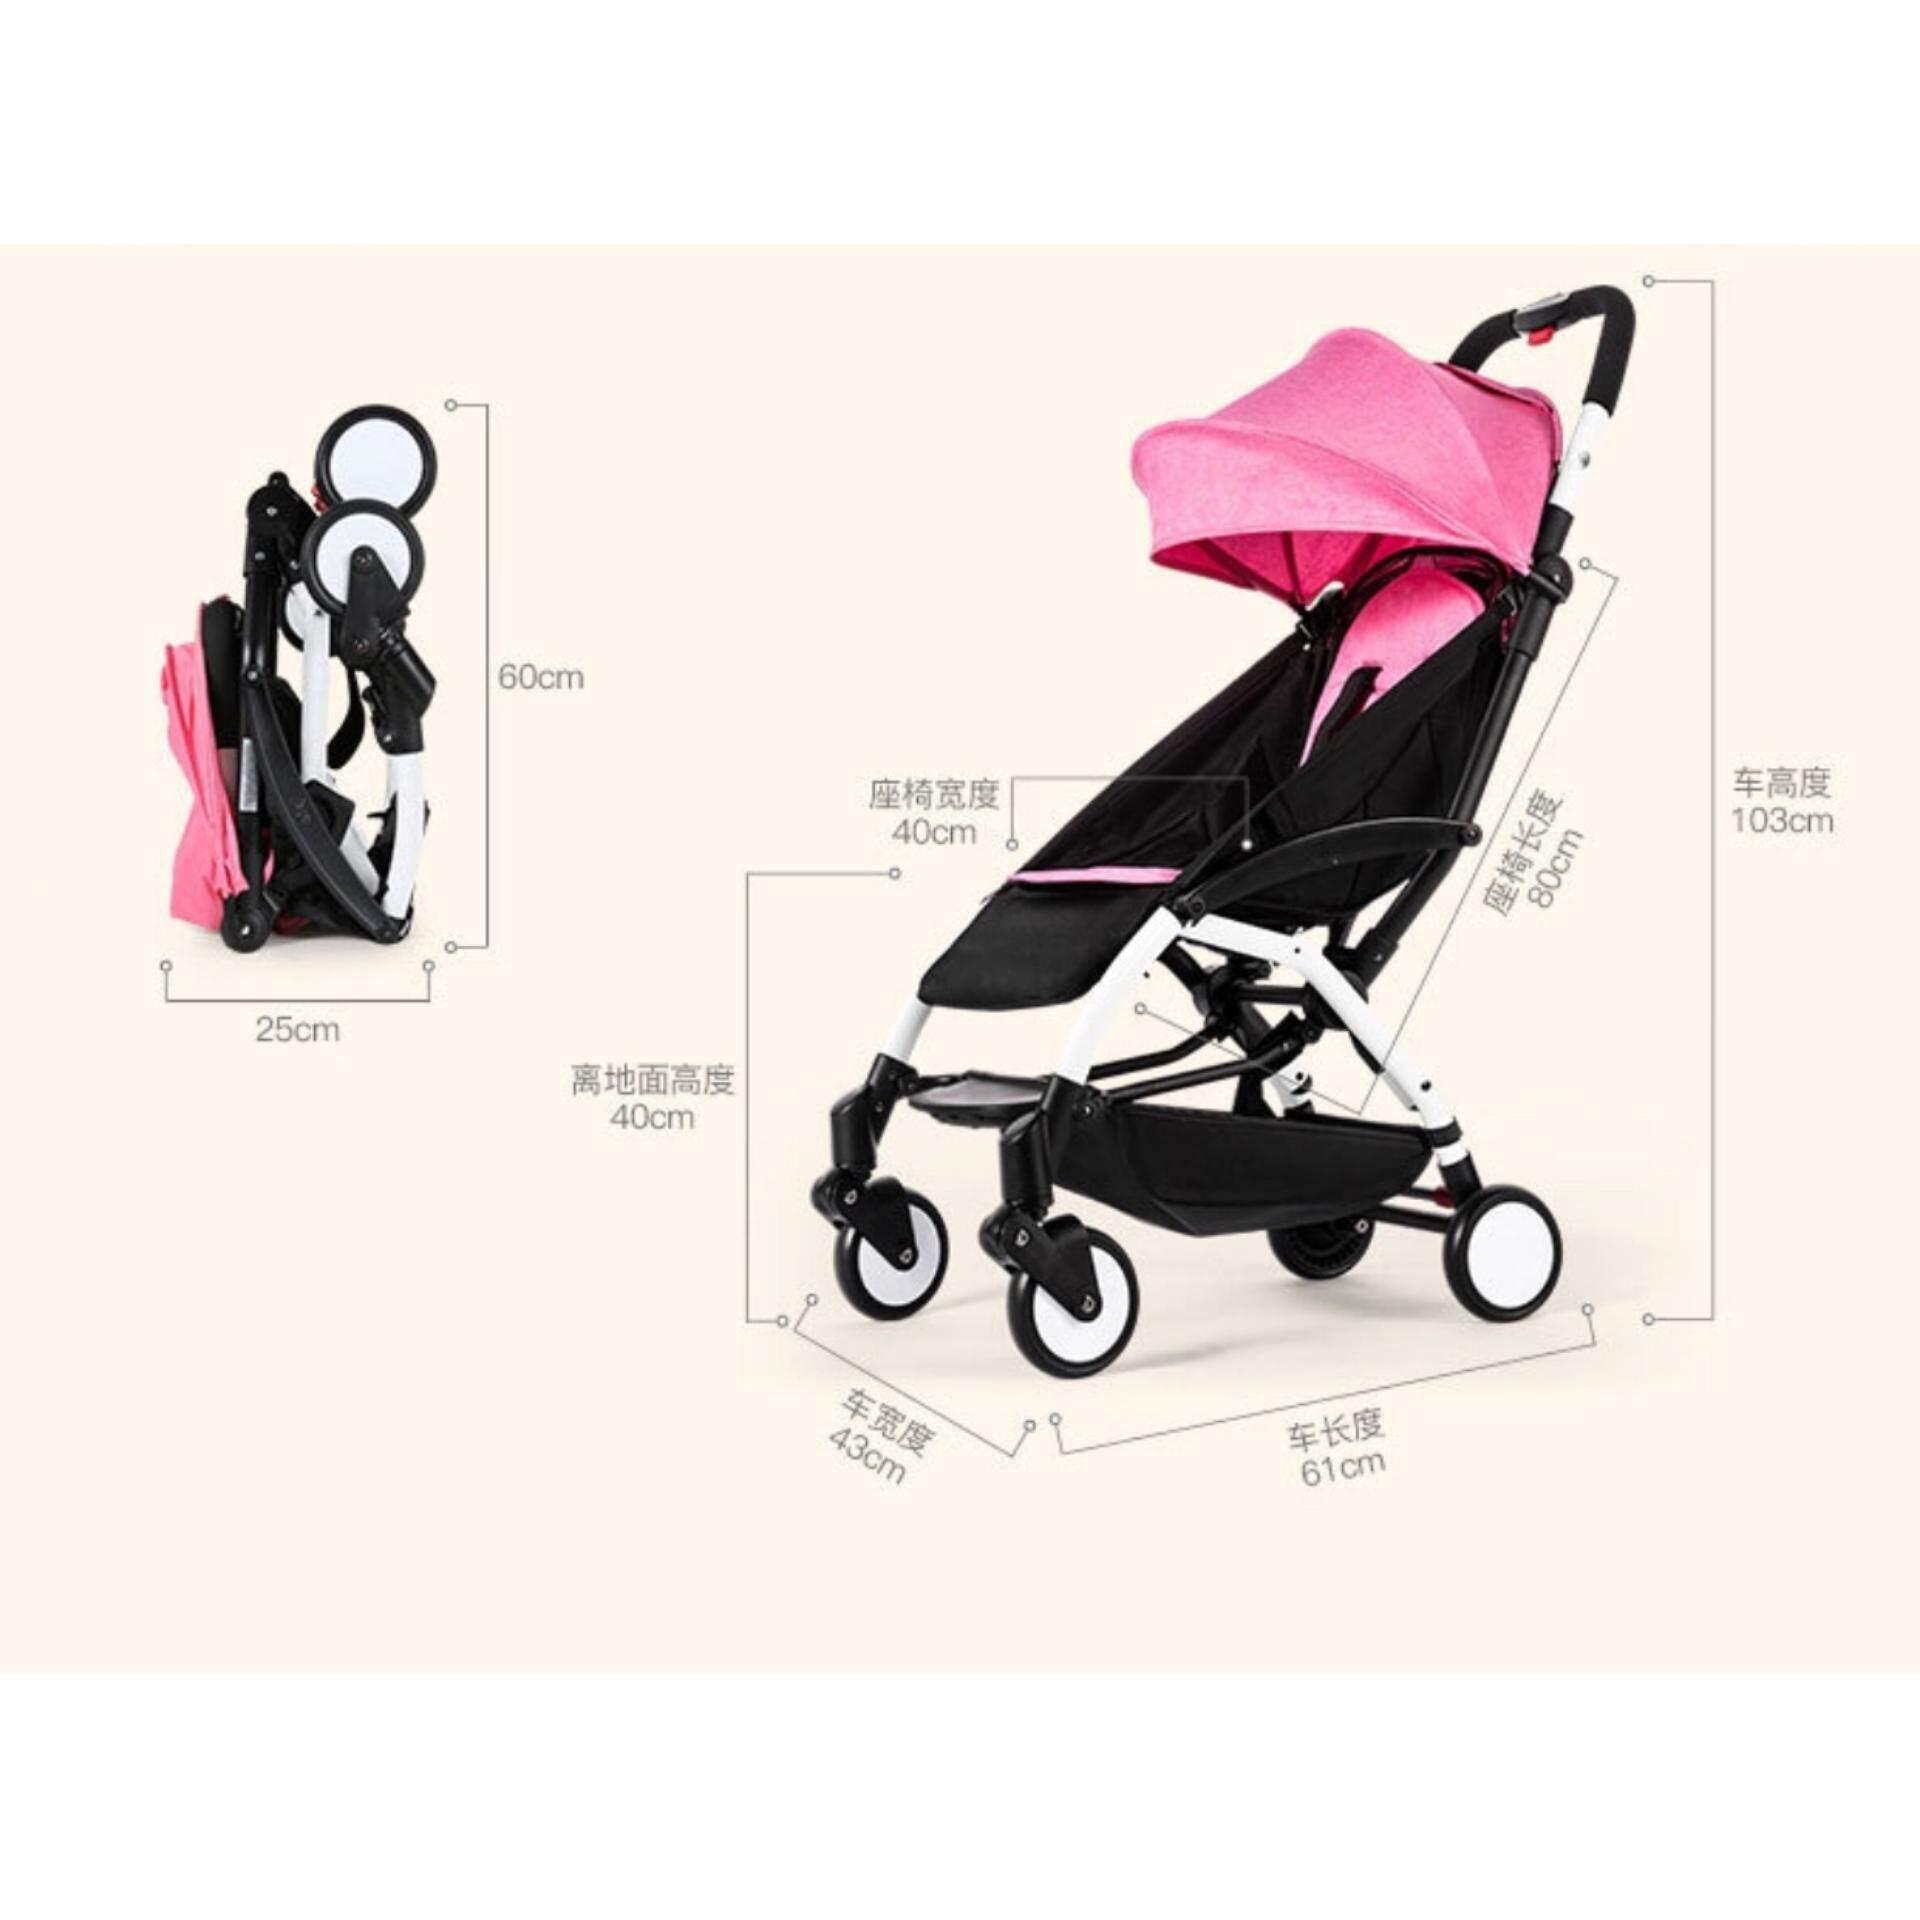 Baby Yoya Stroller Advance Version